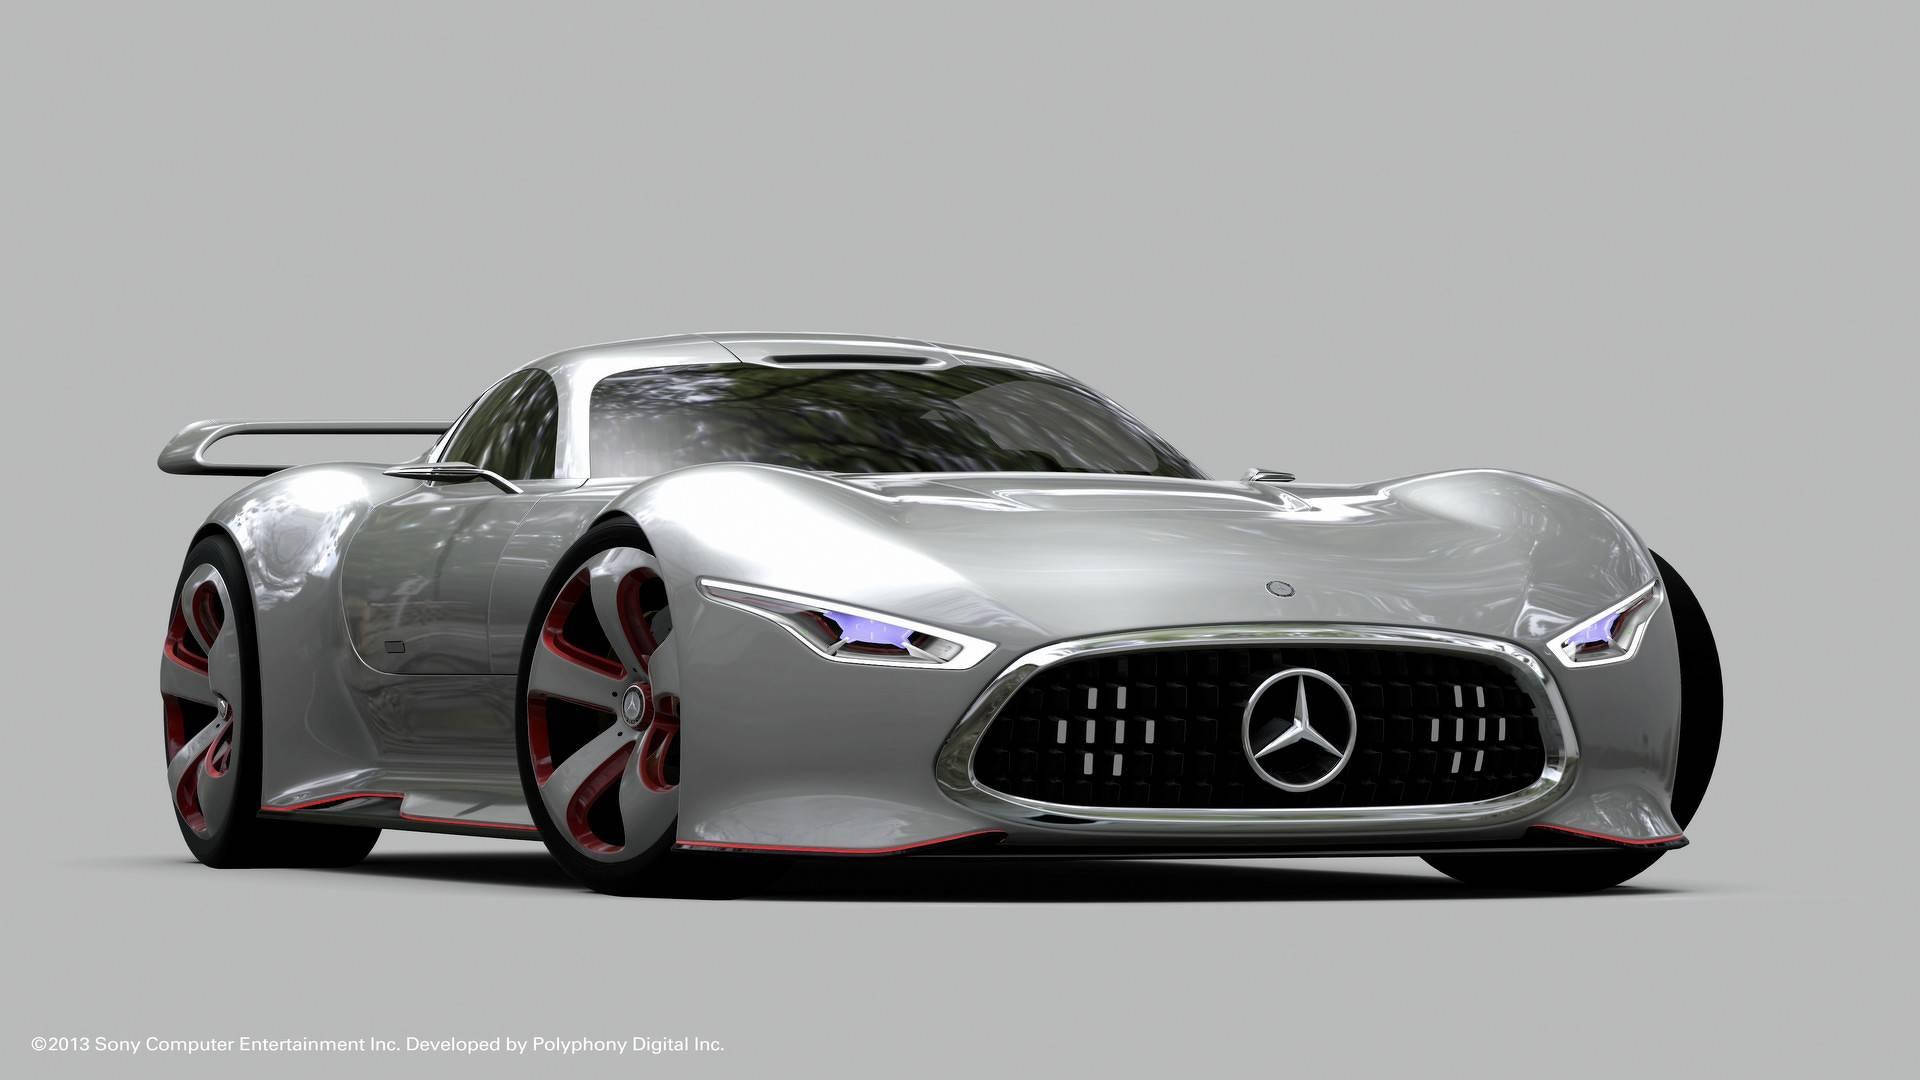 2013 mercedes amg vision gran turismo مرسدس AMG Vision GT نقد و بررسی   اجاره ماشین